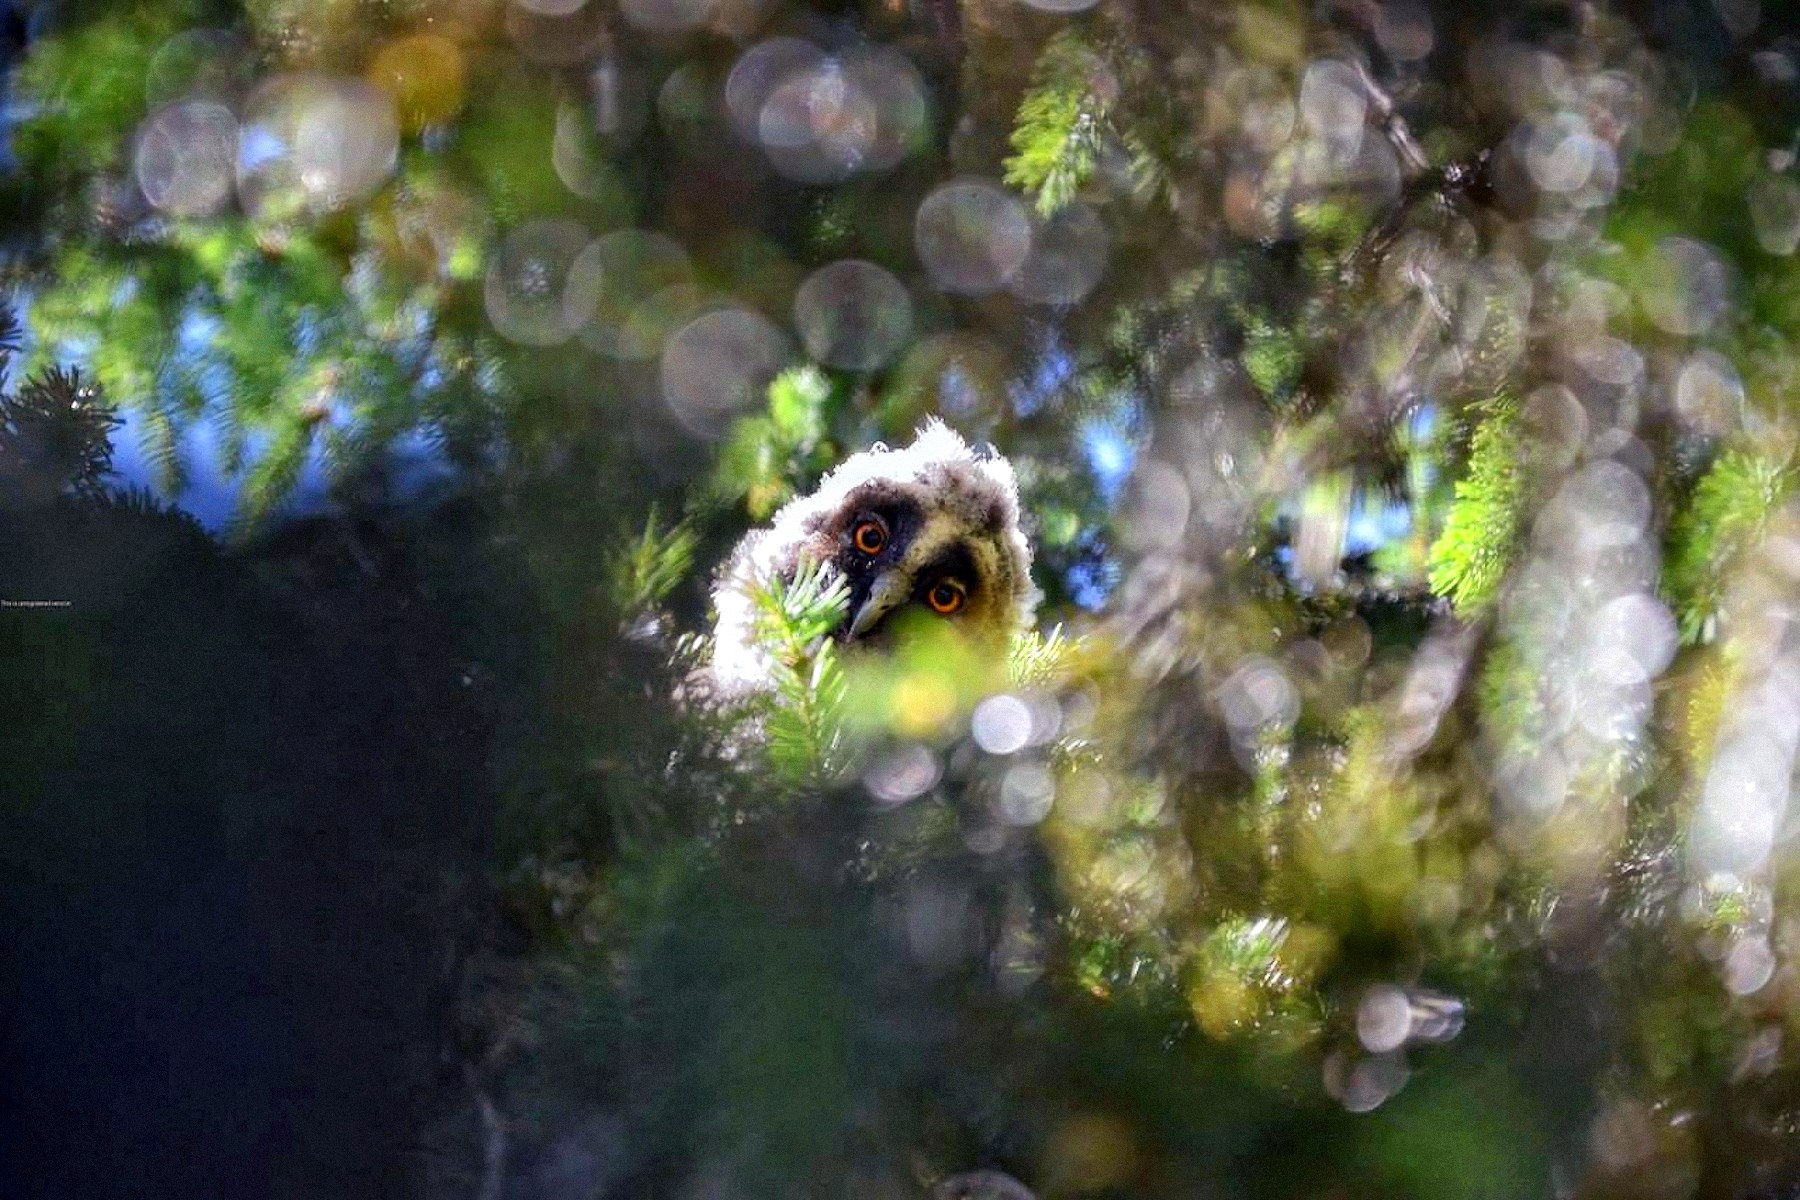 00 Renat Karimov. Owl near the Village in Tatarstan. 2015